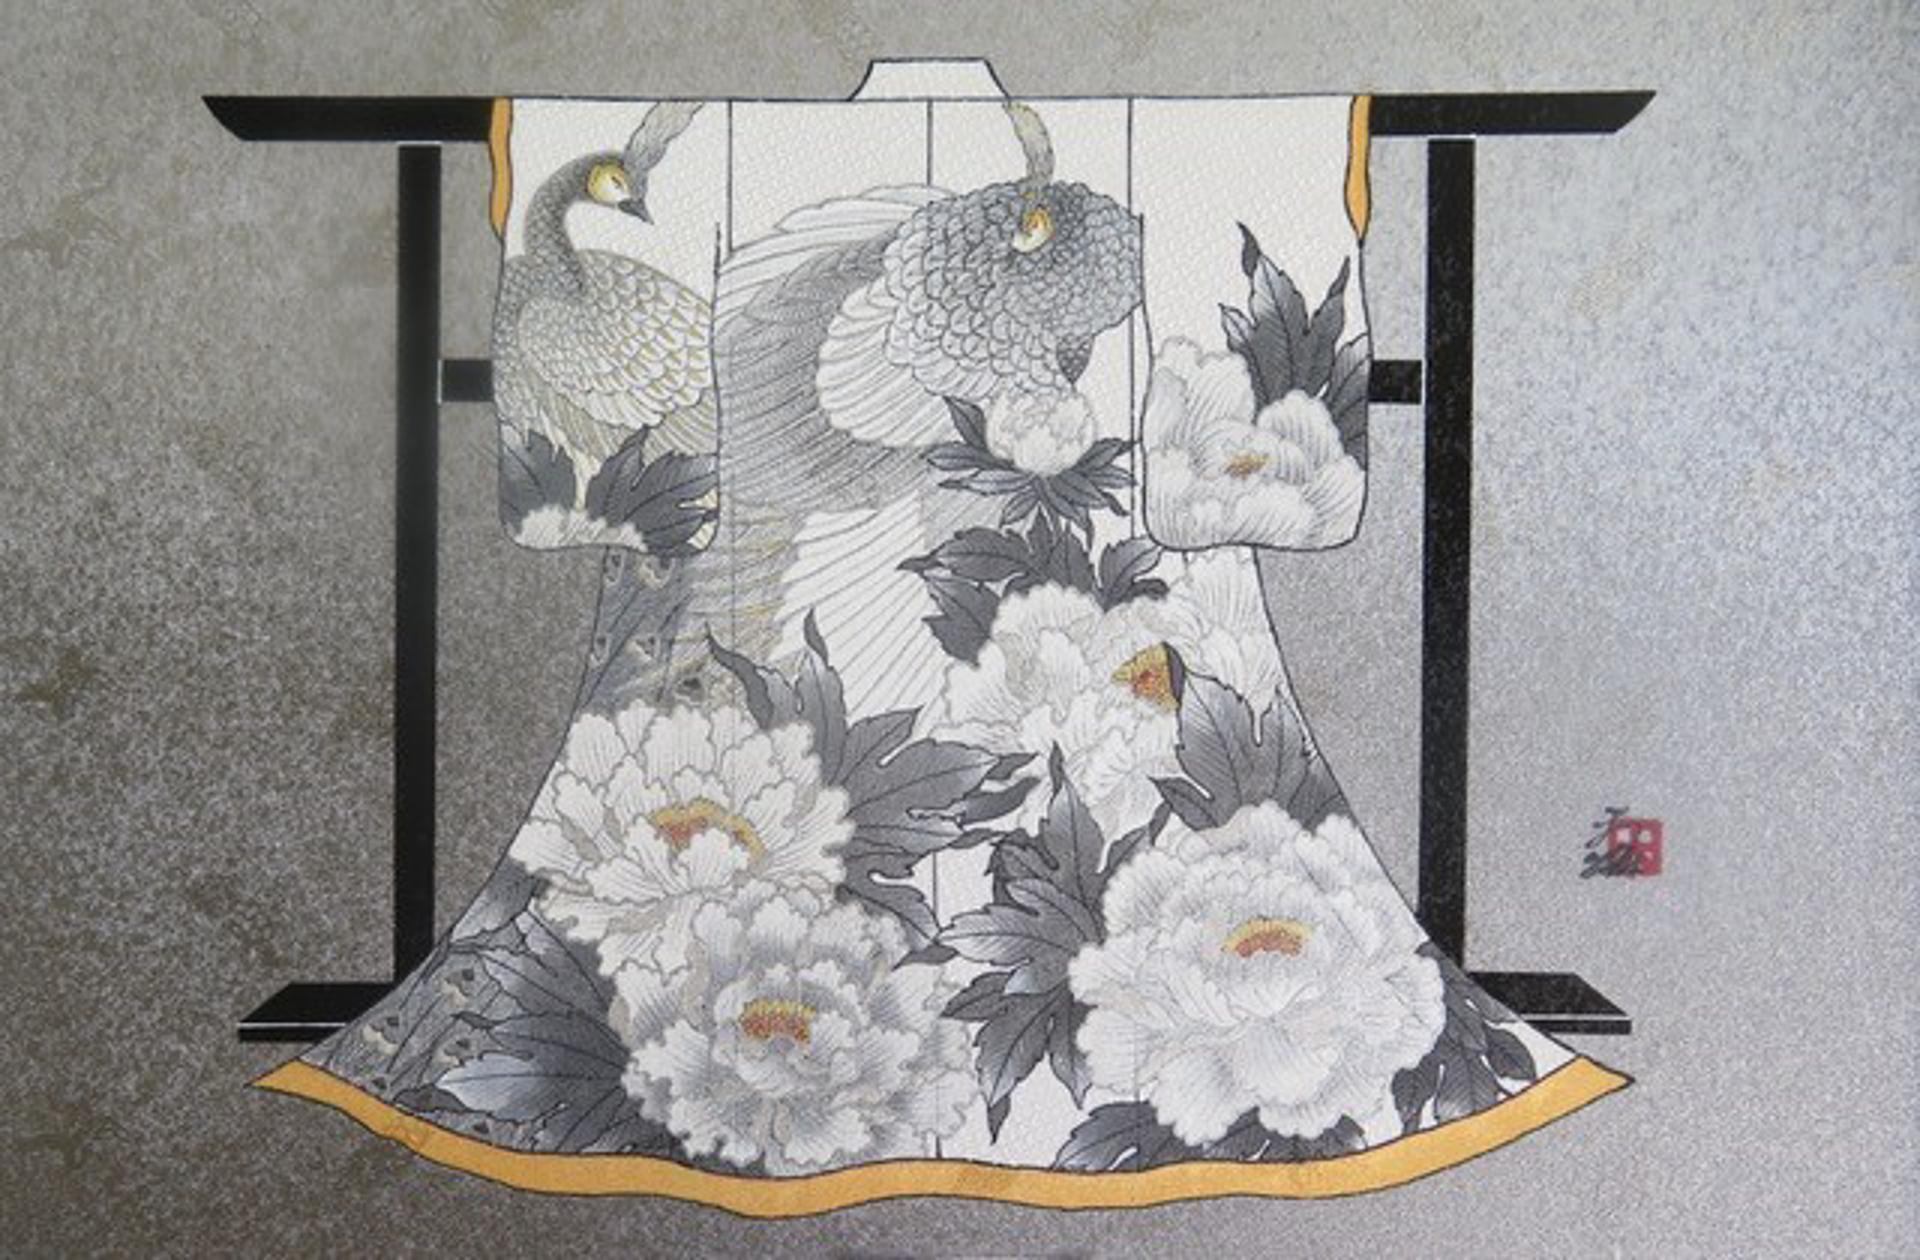 NATURE'S KEEPER #6 (Mini Kimono) by Hisashi Otsuka